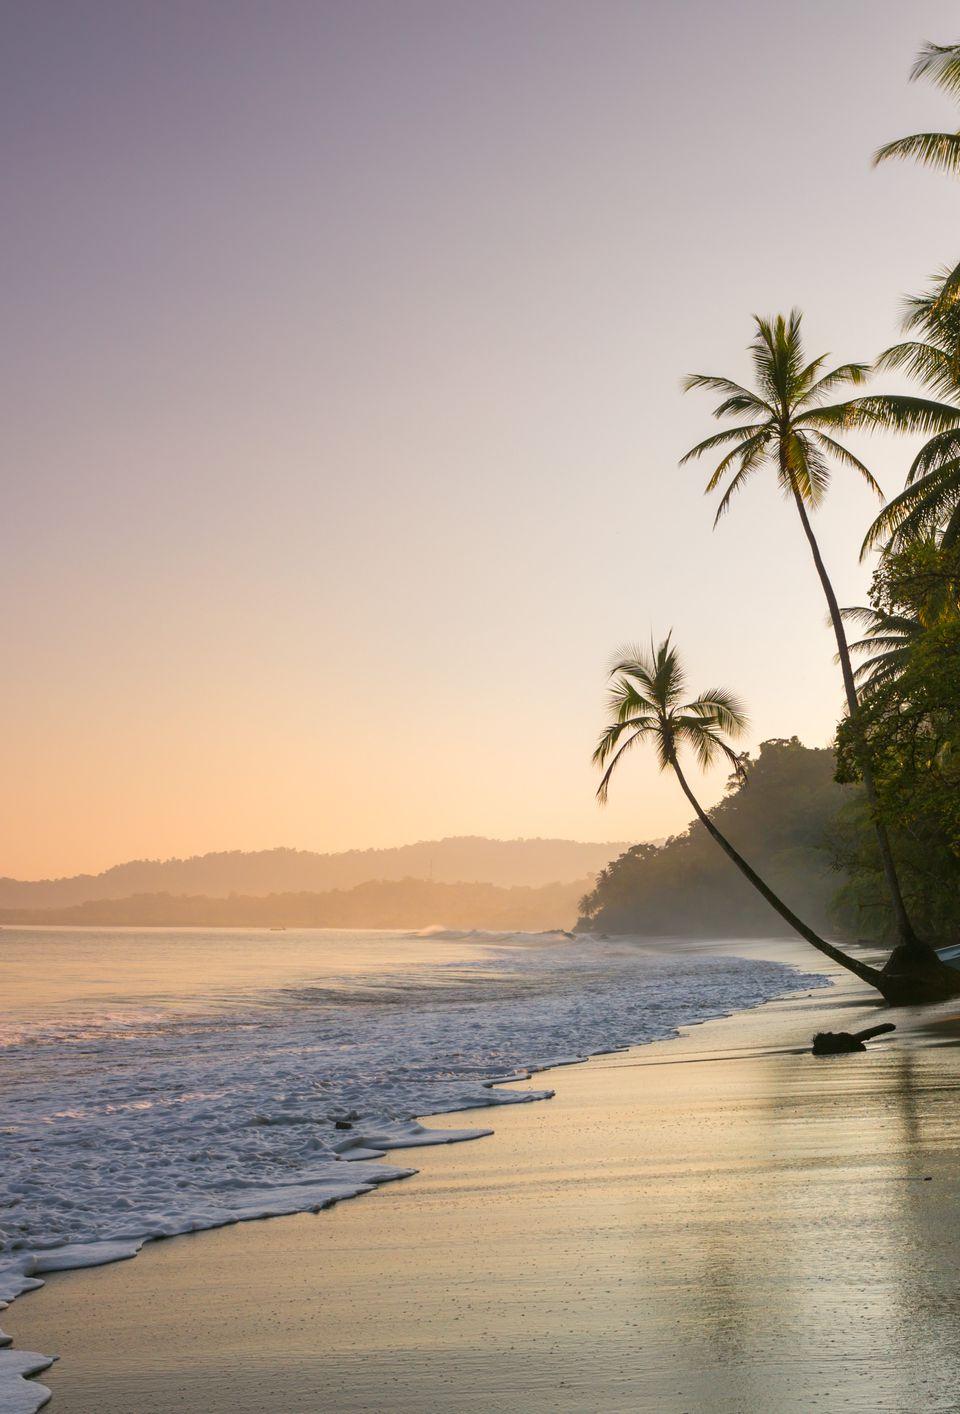 Sunset on palm fringed beach, Costa Rica